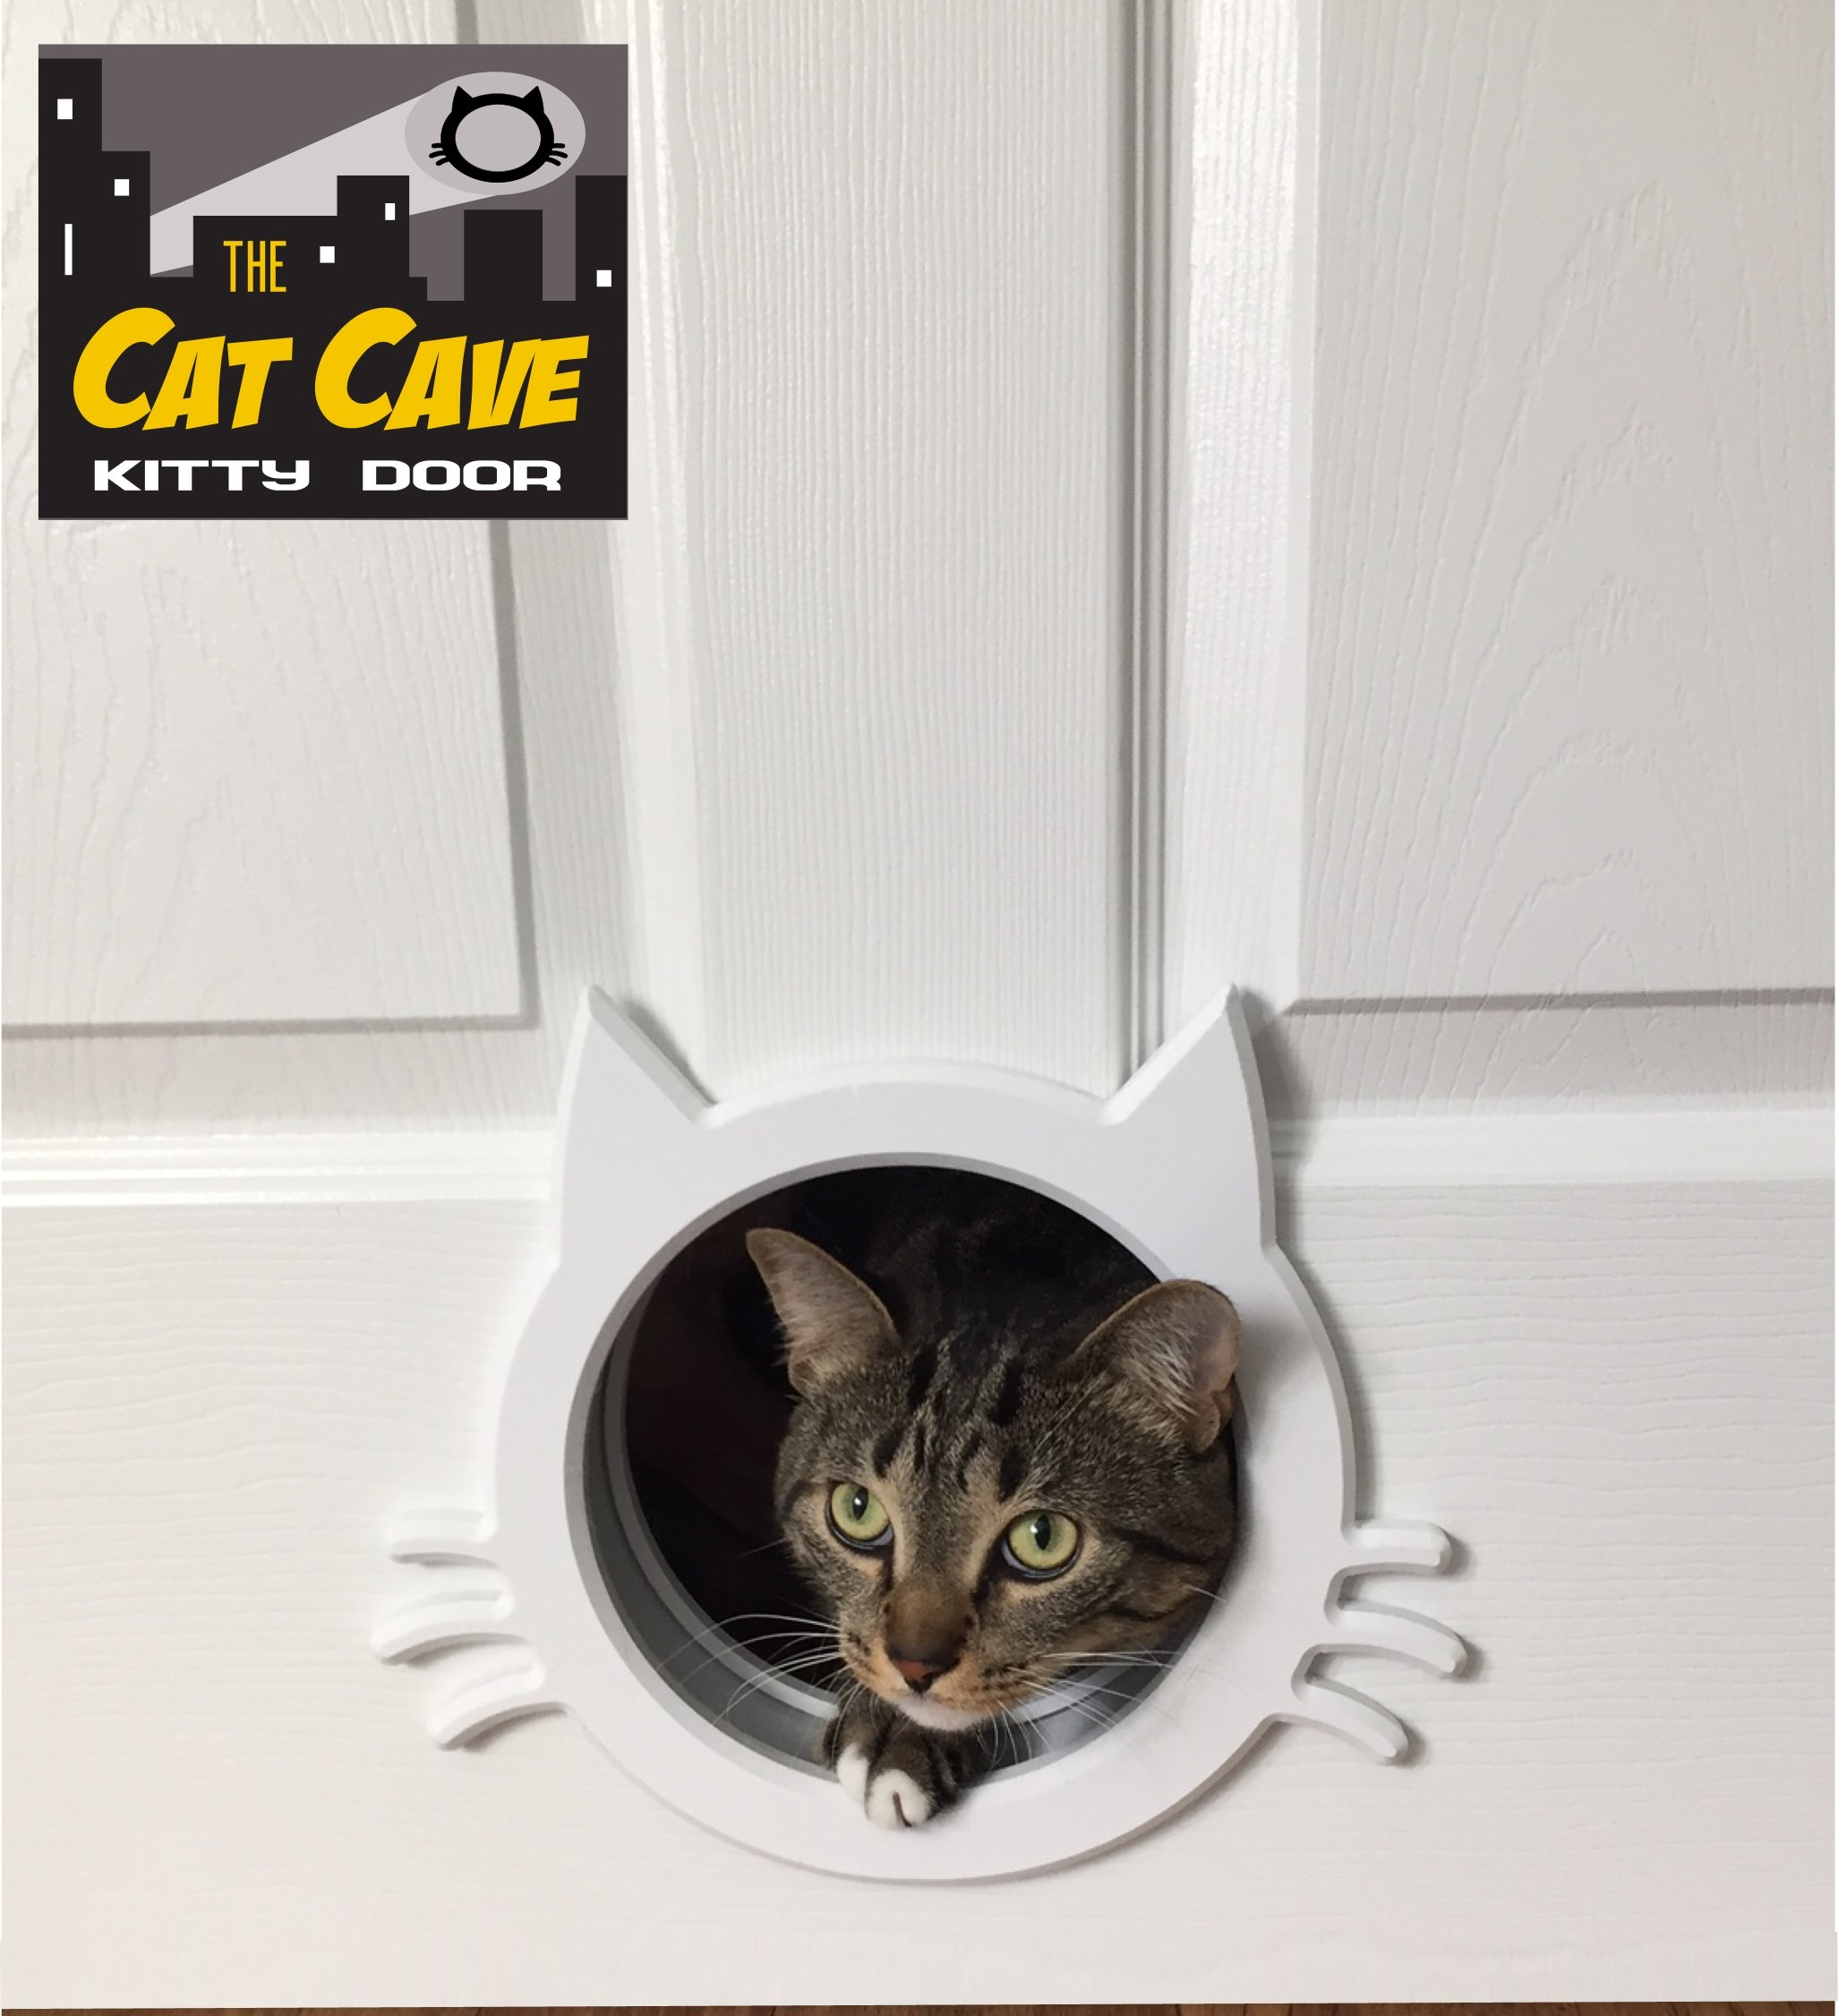 The Cat Cave Interior Cat Door gate way